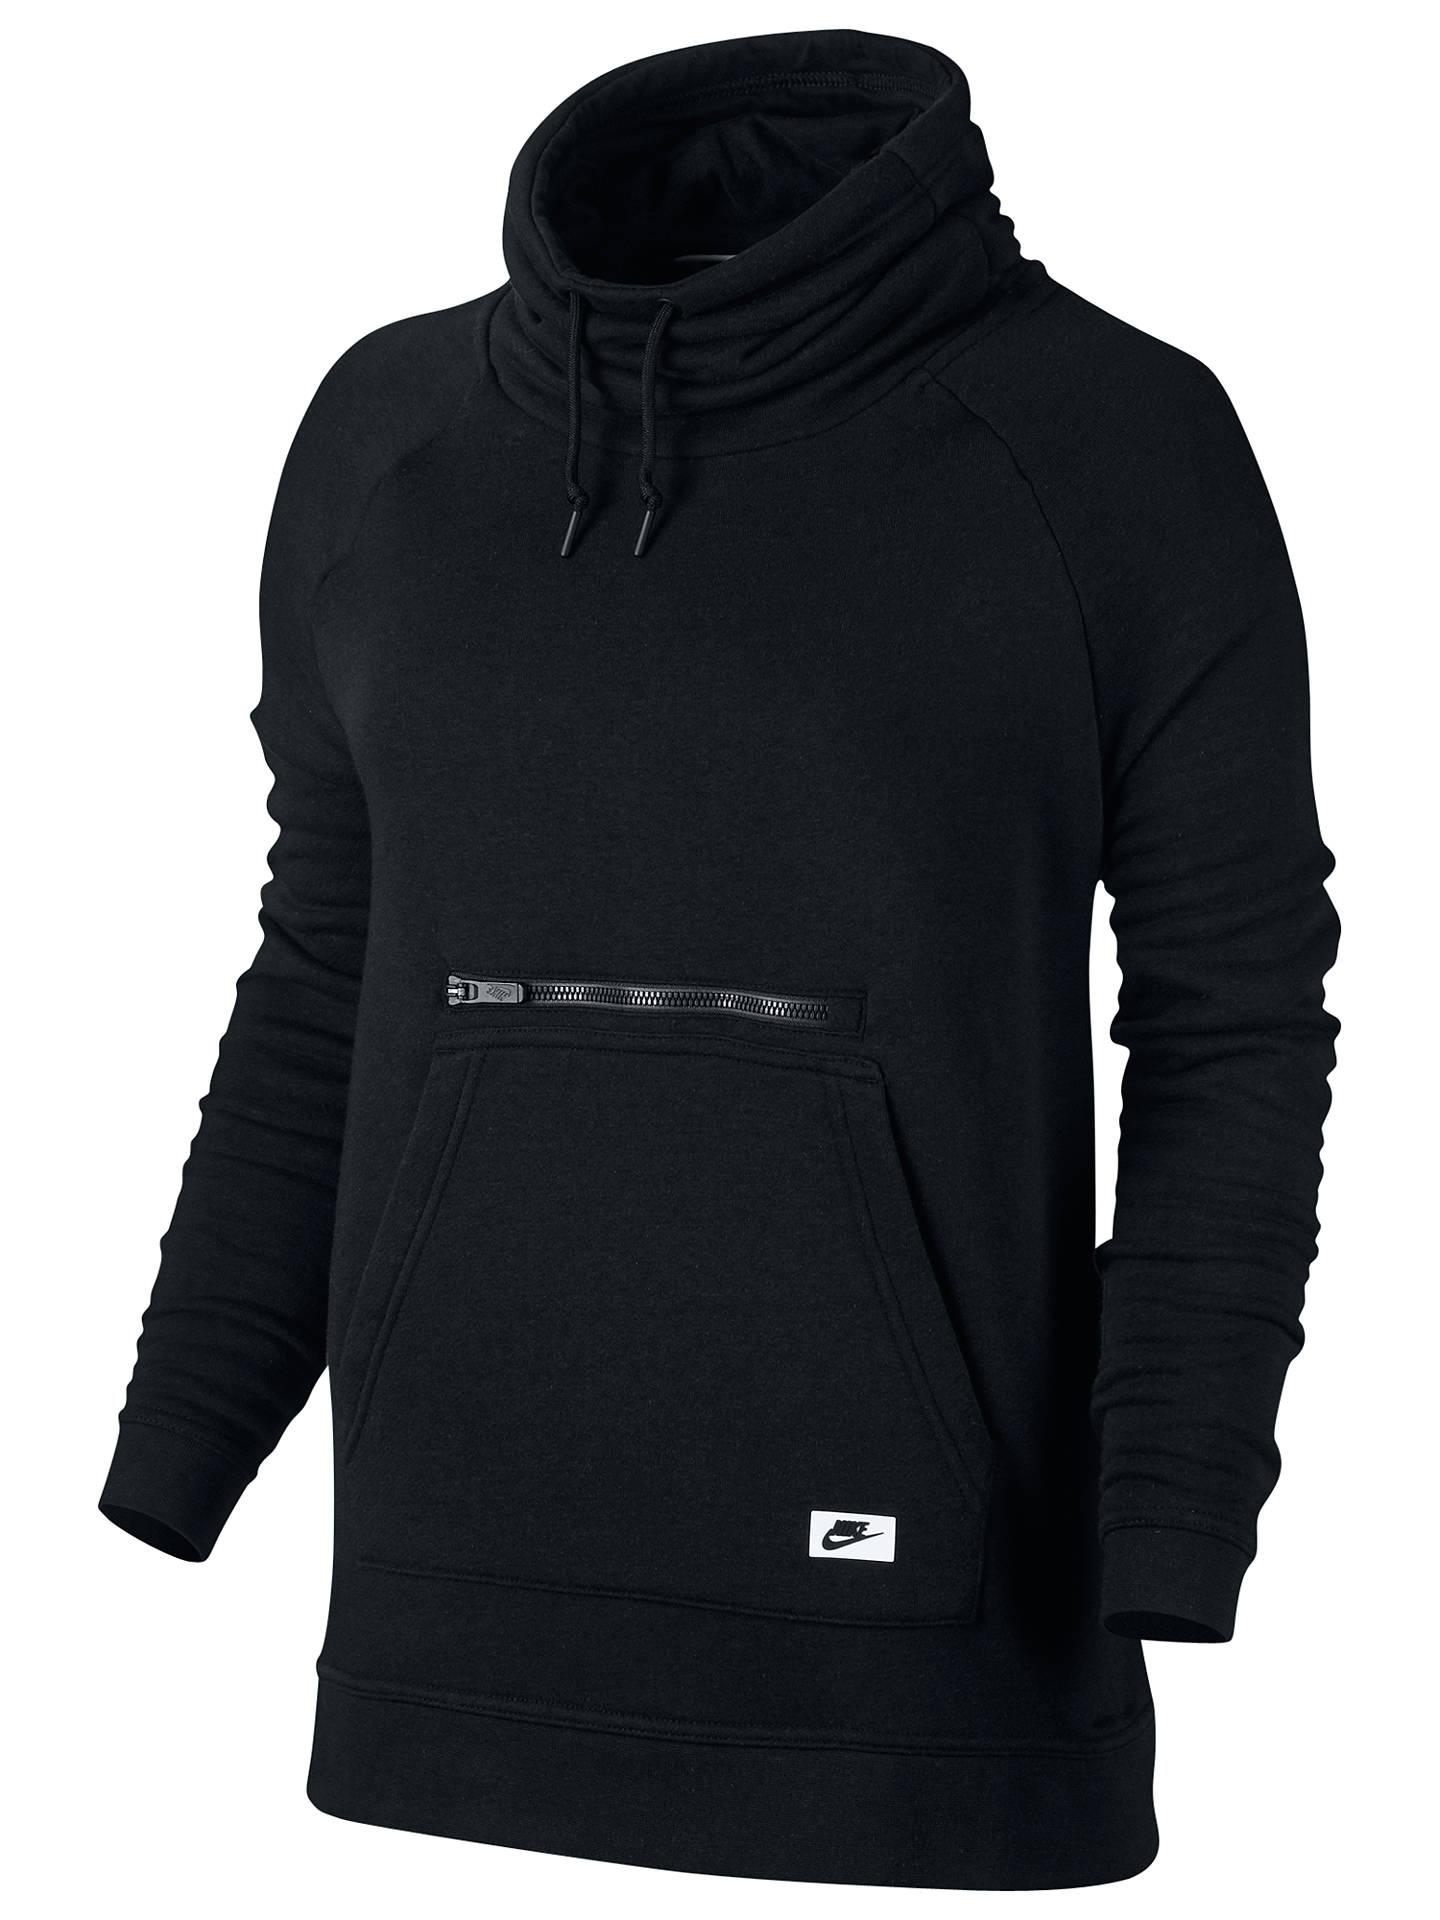 3905928c2d11 Nike Sportswear Modern Funnel-Neck Hoodie at John Lewis   Partners